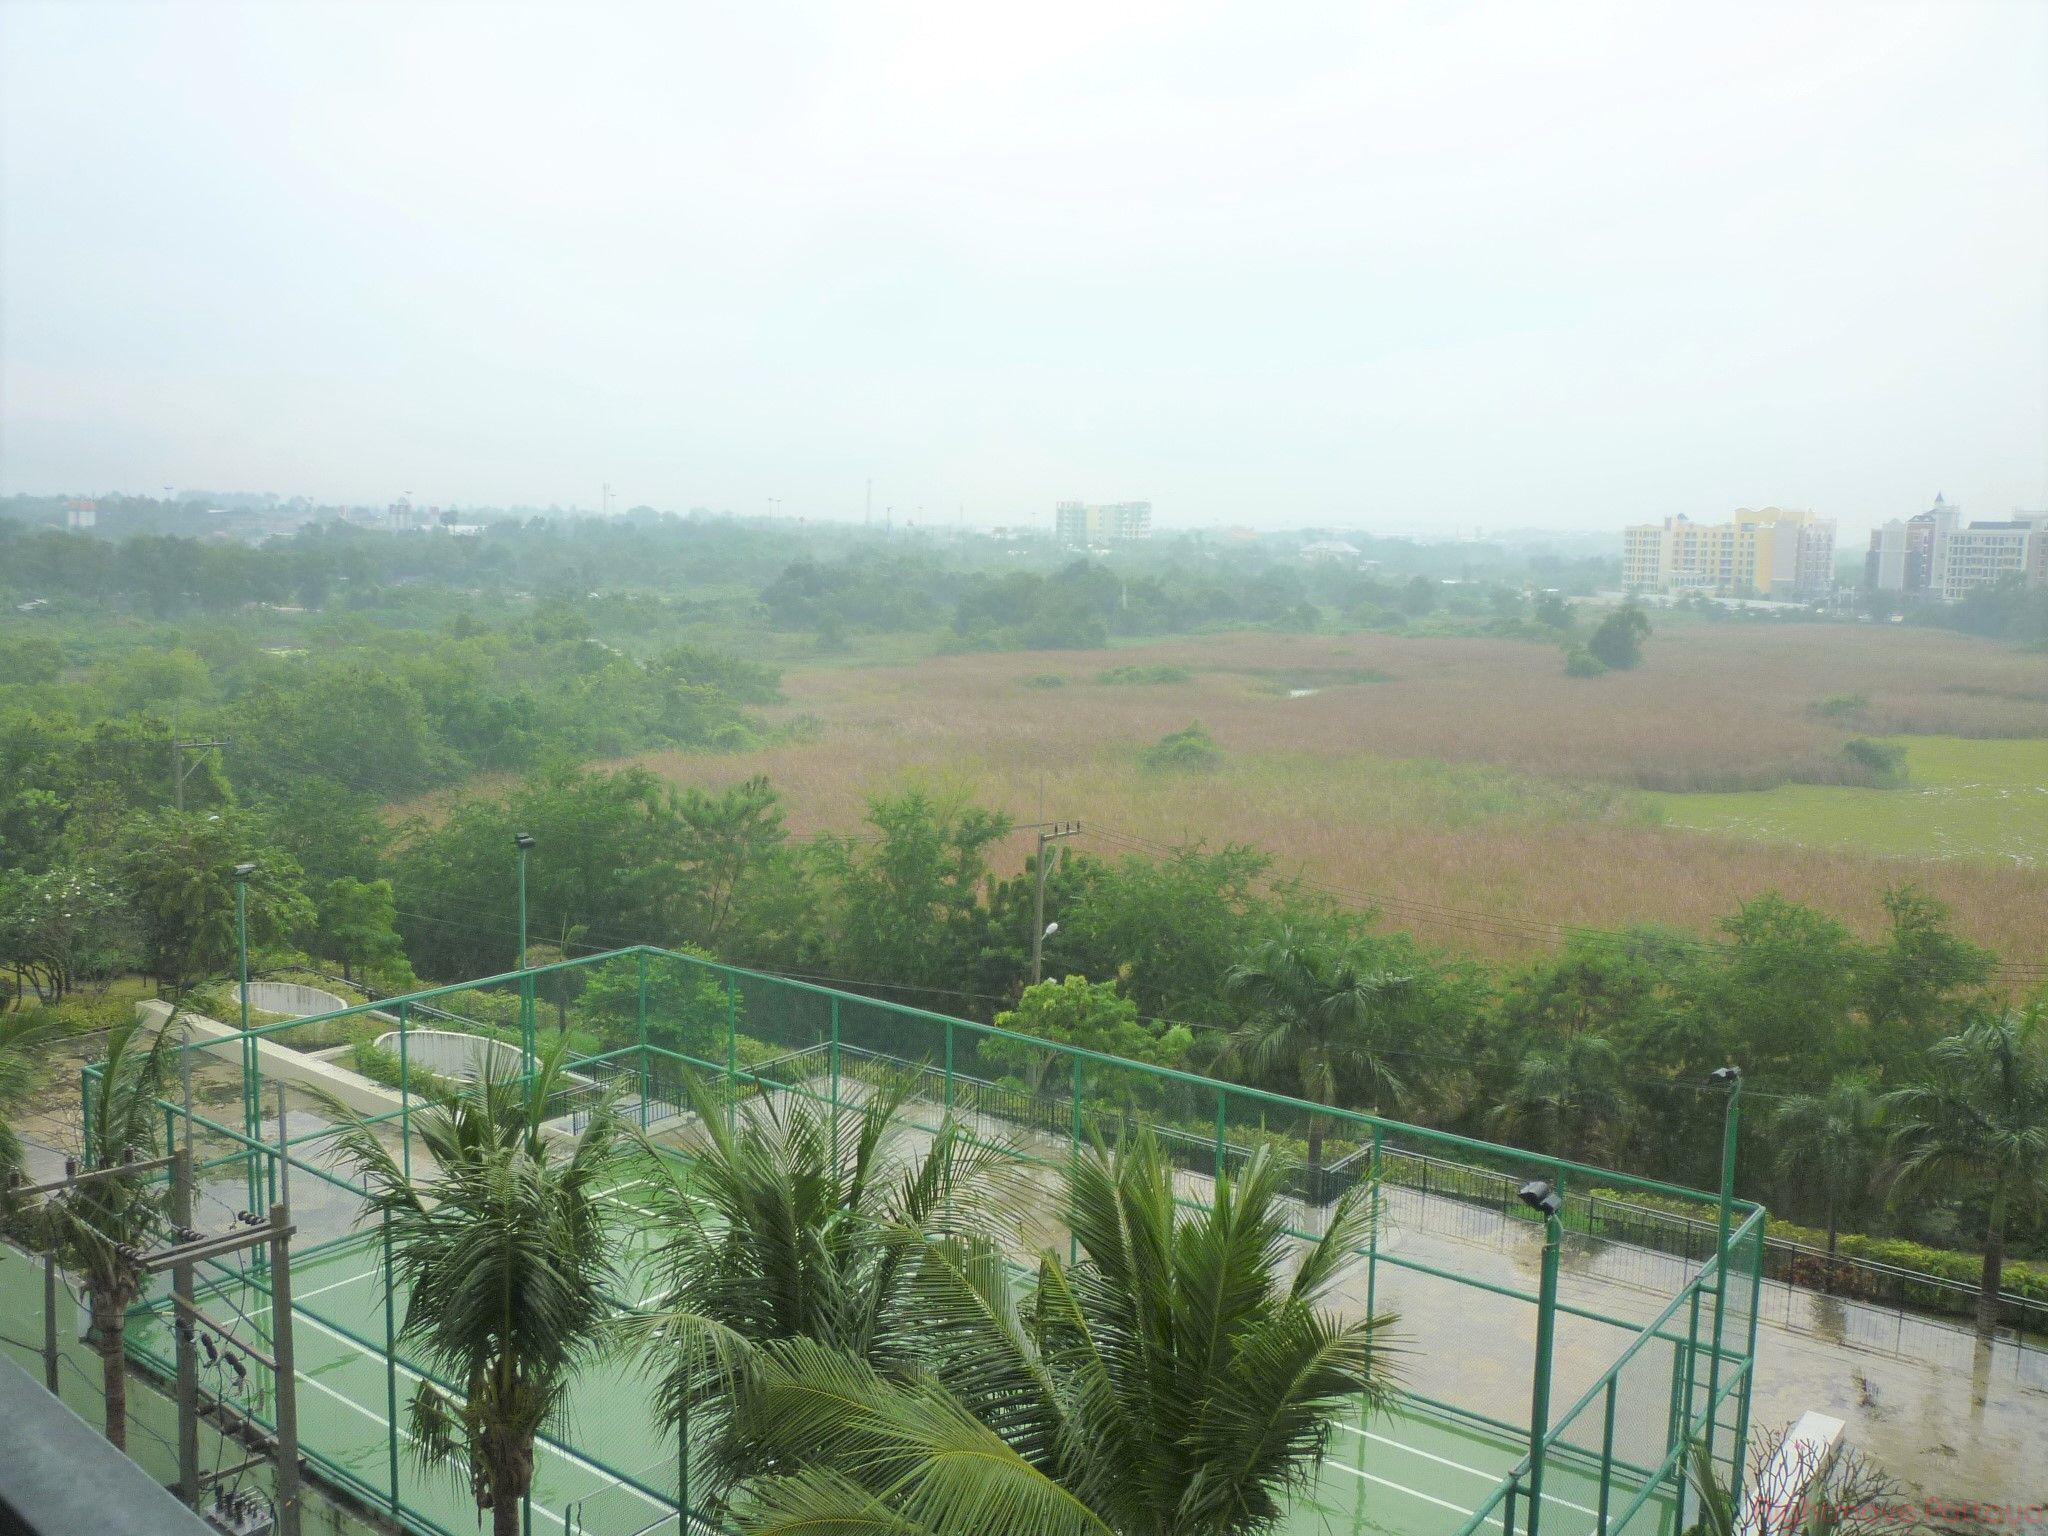 pic-2-Rightmove Pattaya Porchland 2 Jomtien Resort Condominiums for sale in Jomtien Pattaya